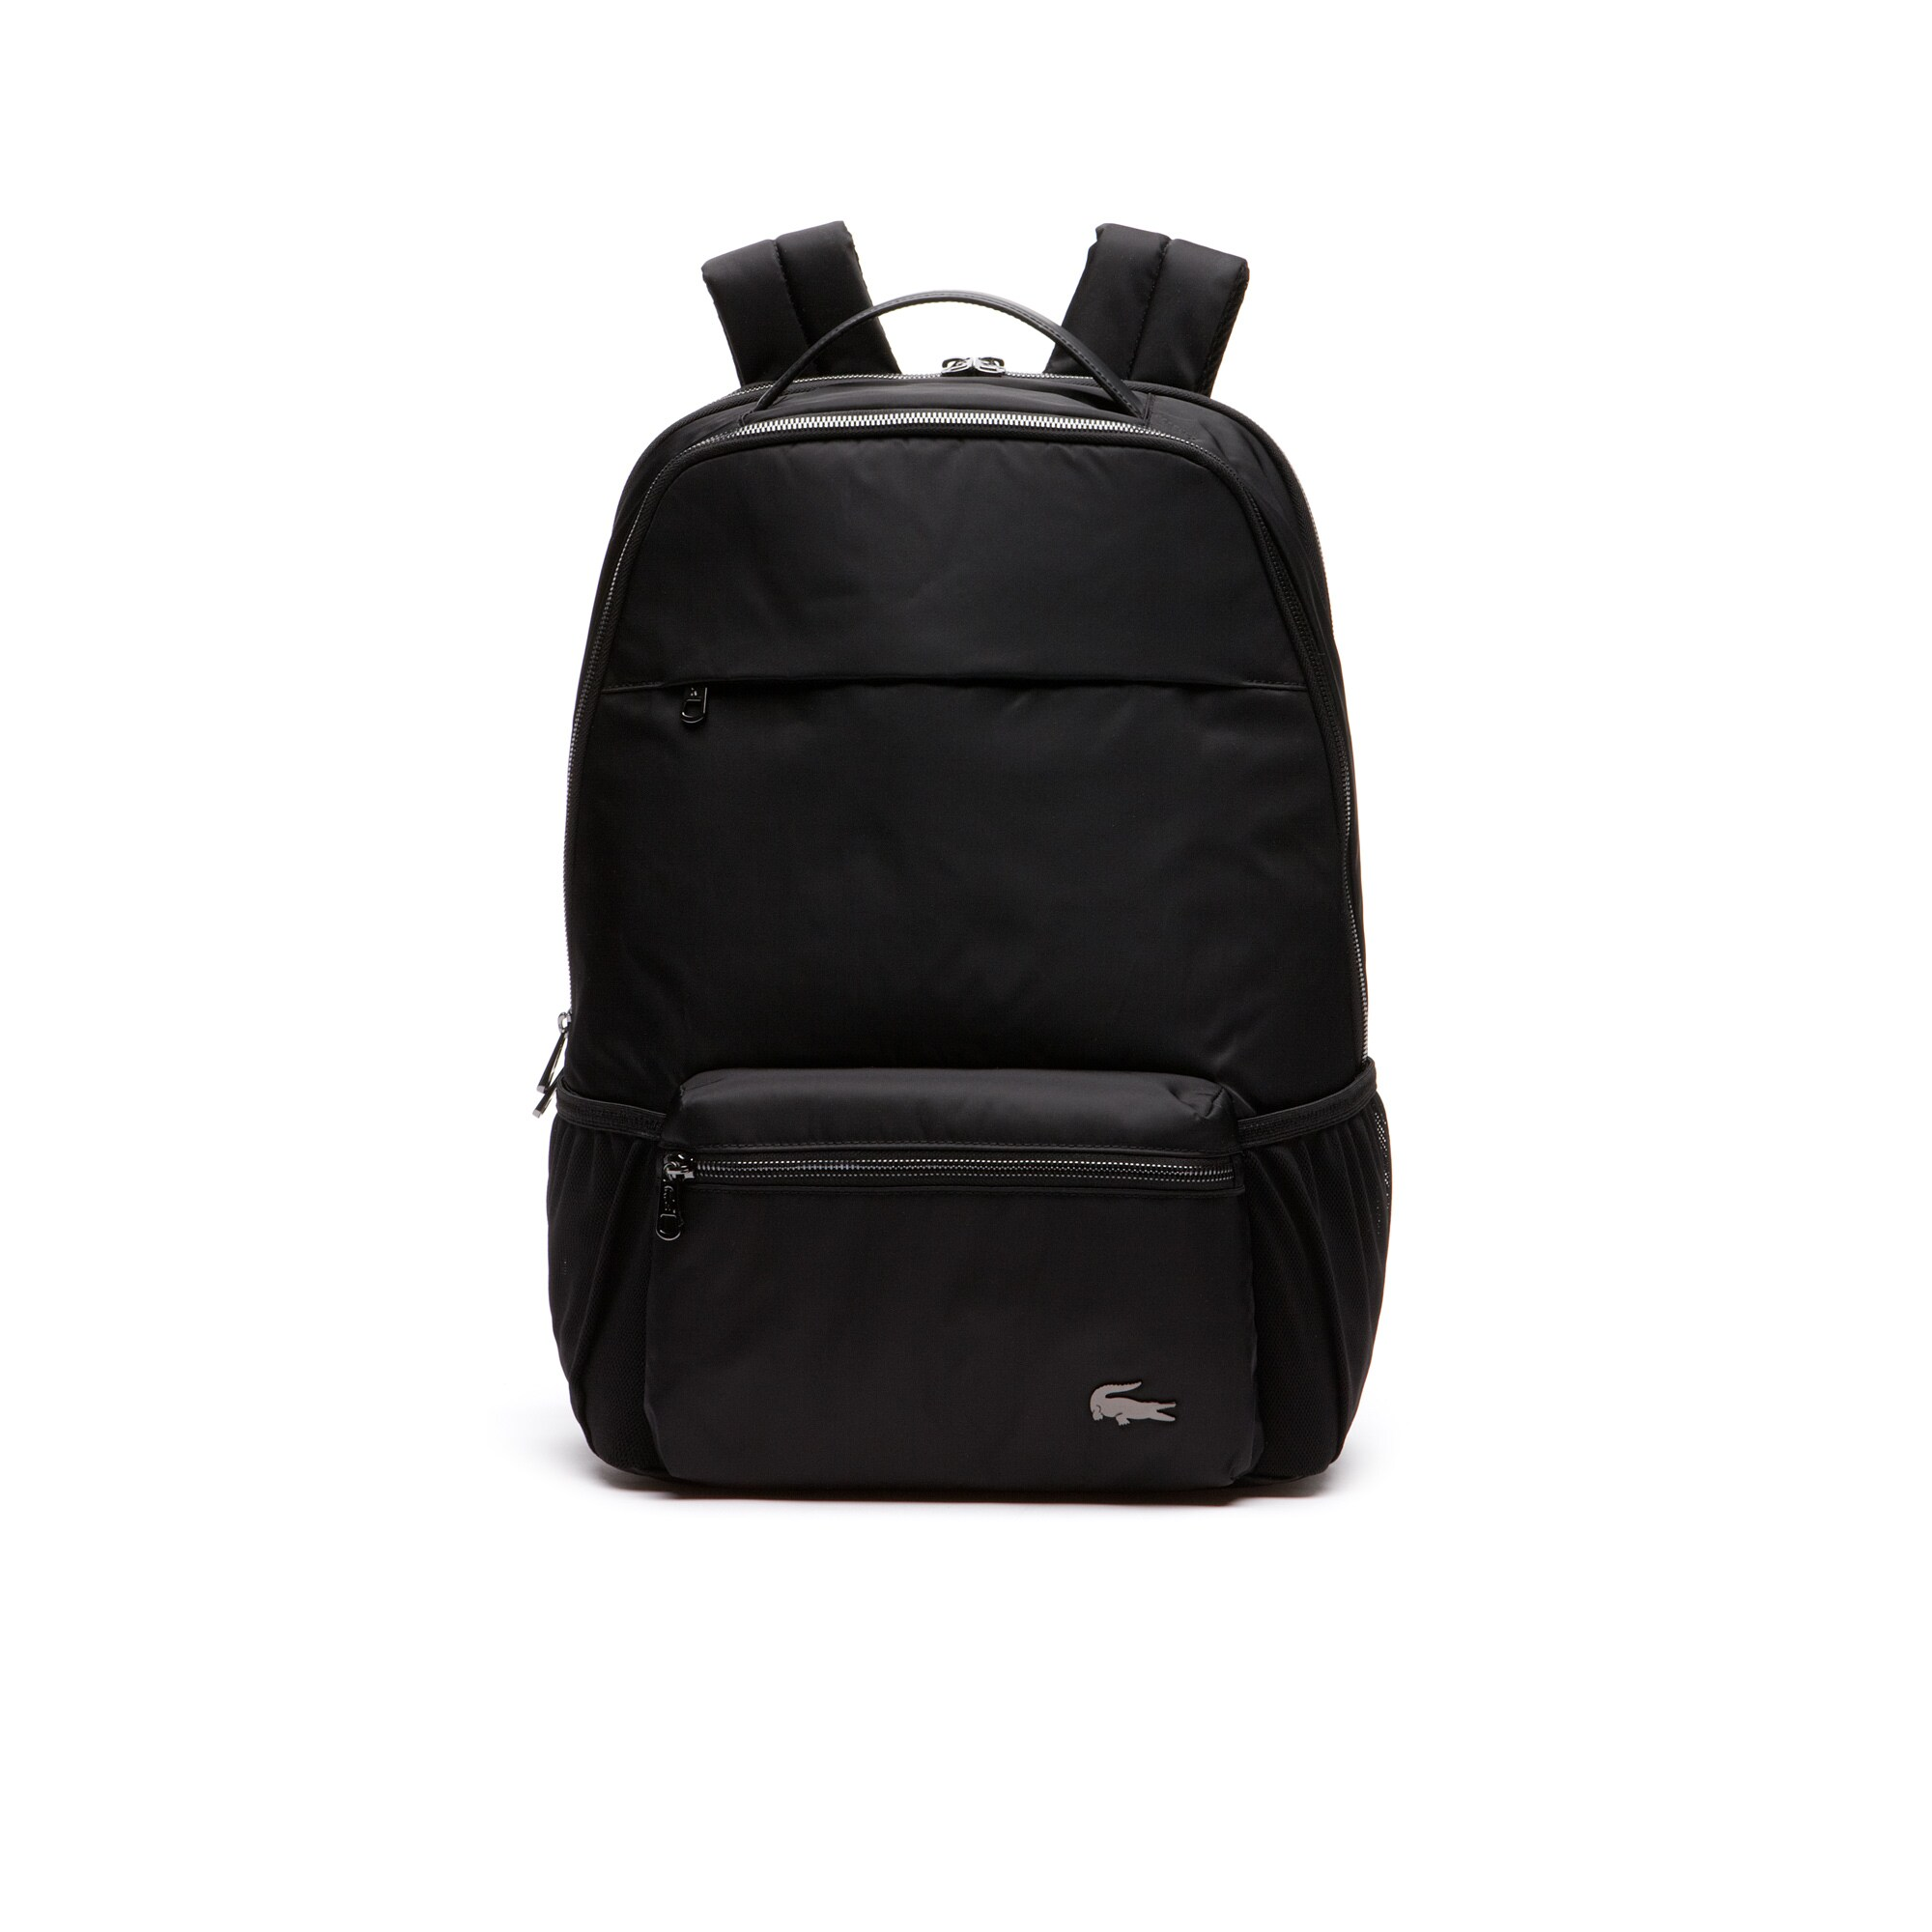 Men's Pete Monochrome Backpack - Large Format